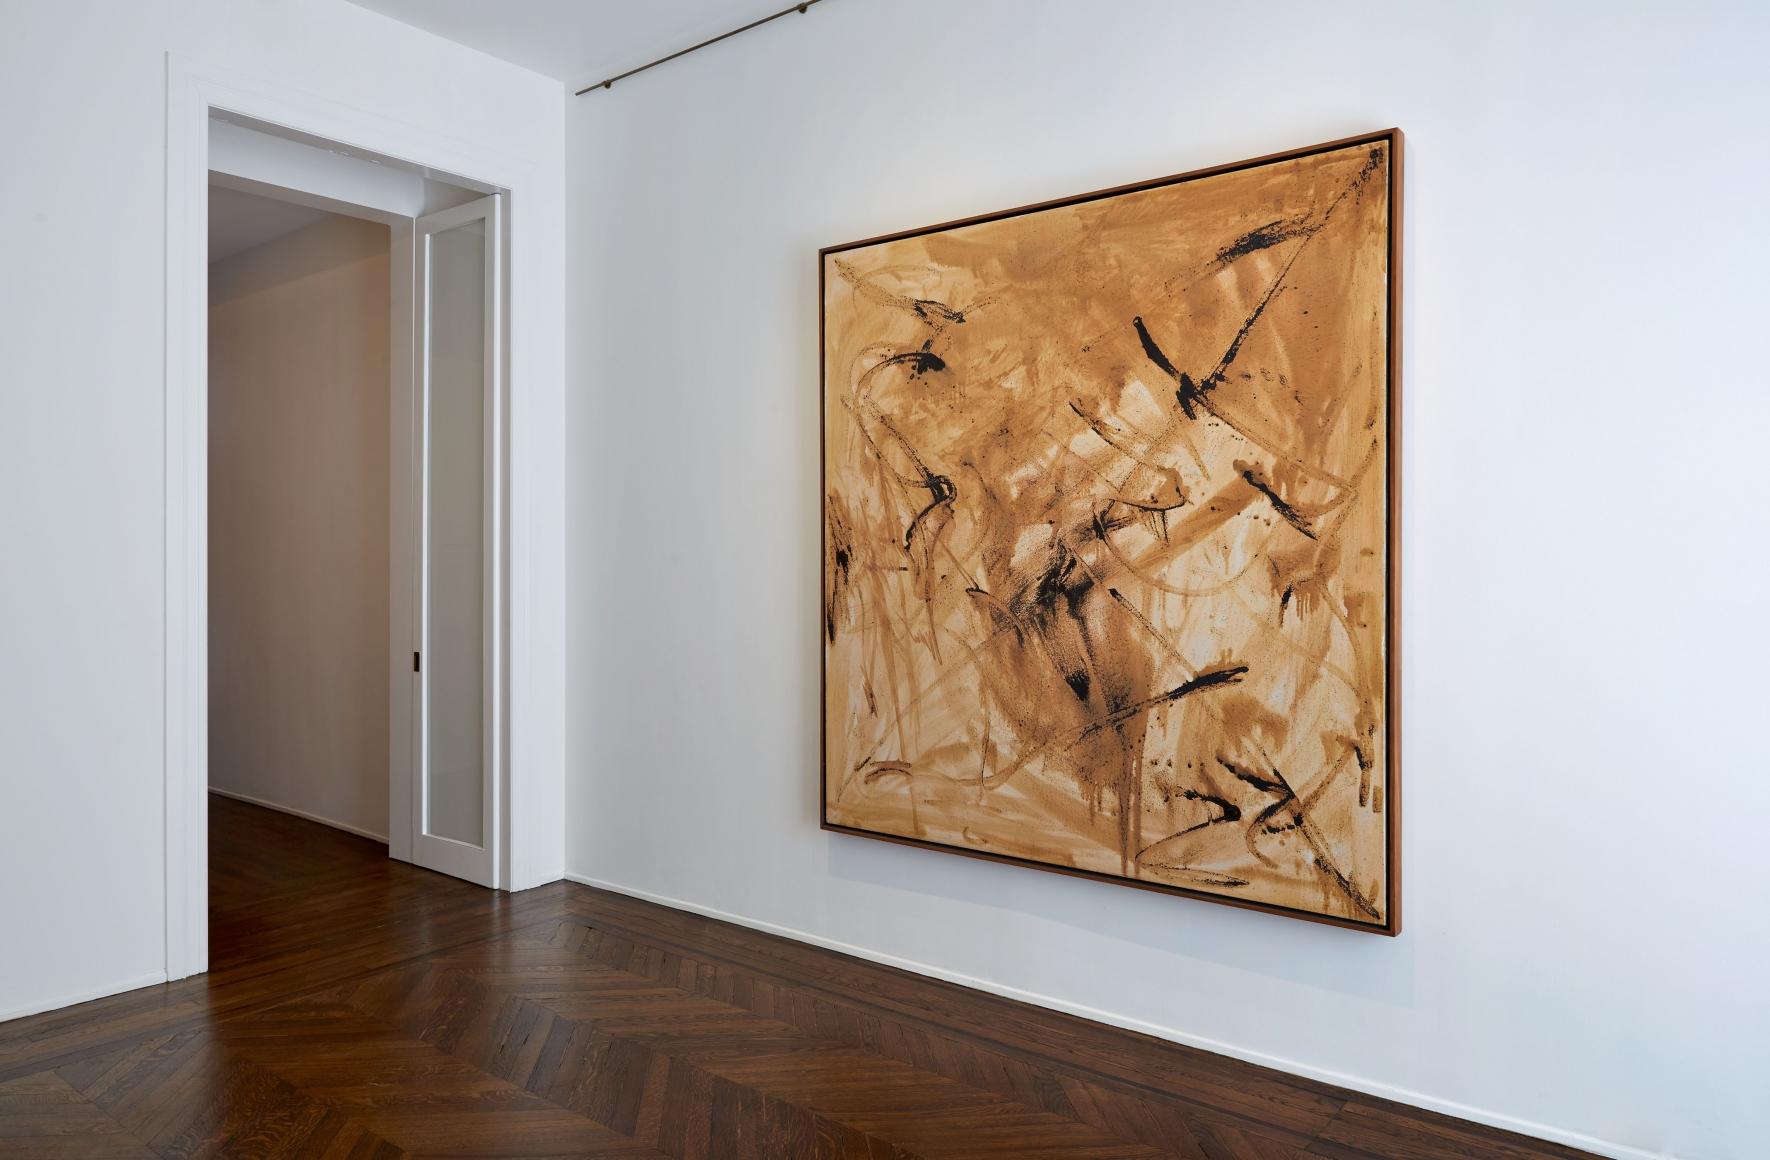 Sigmar Polke, Silver Paintings, New York, 2015, Installation Image 5